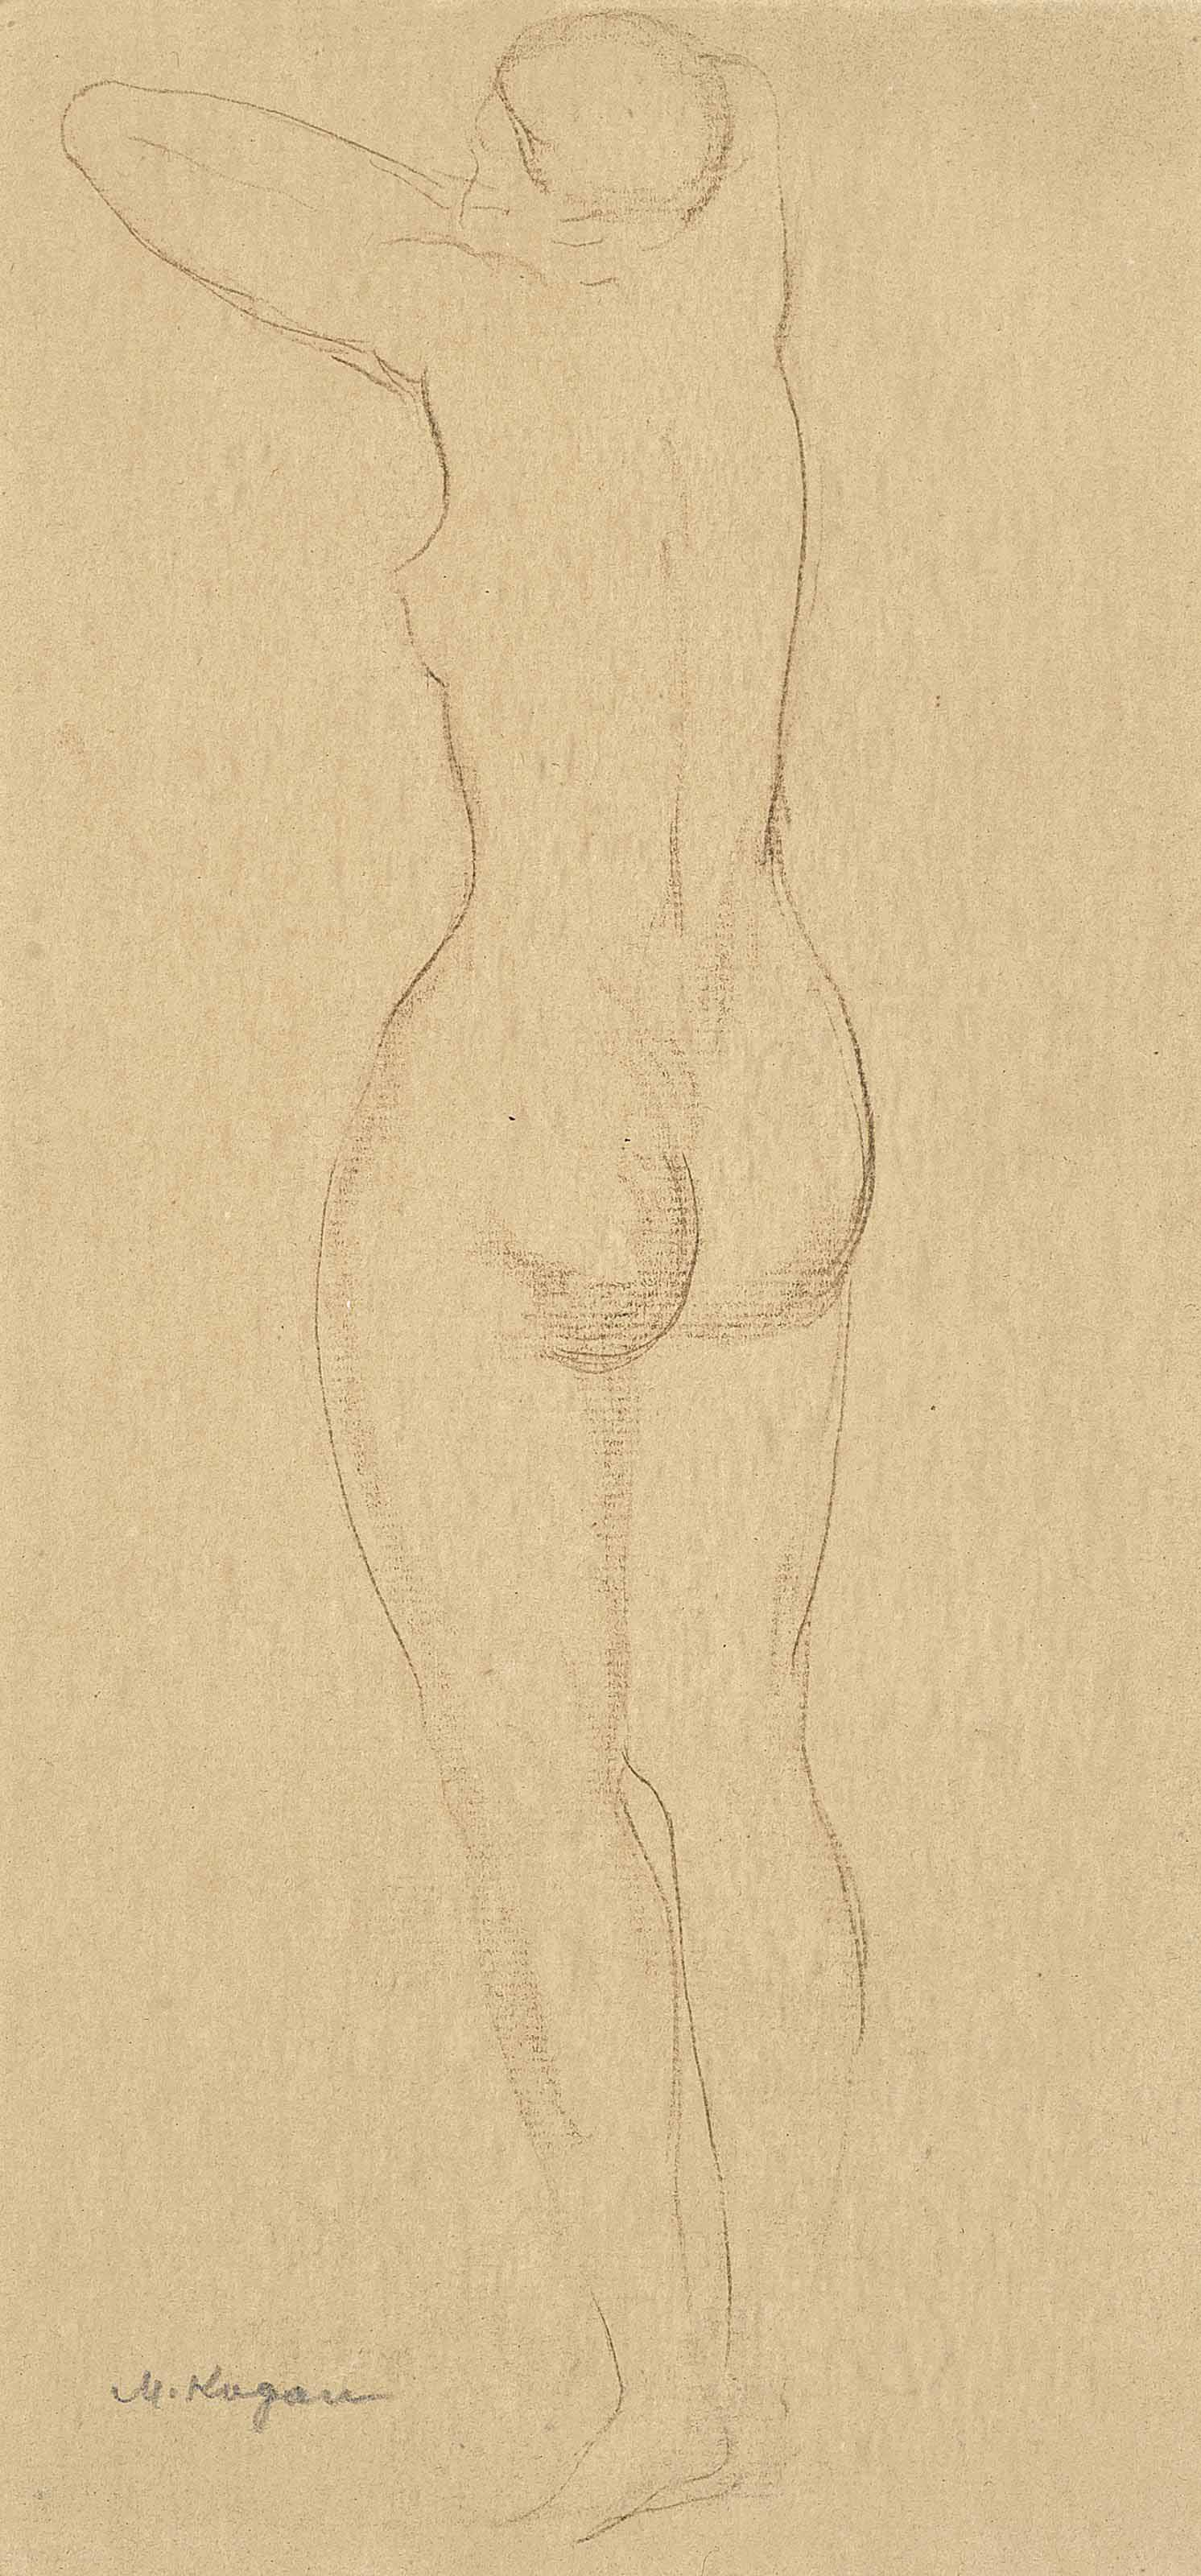 Moissey Kogan (Russian, 1879-1